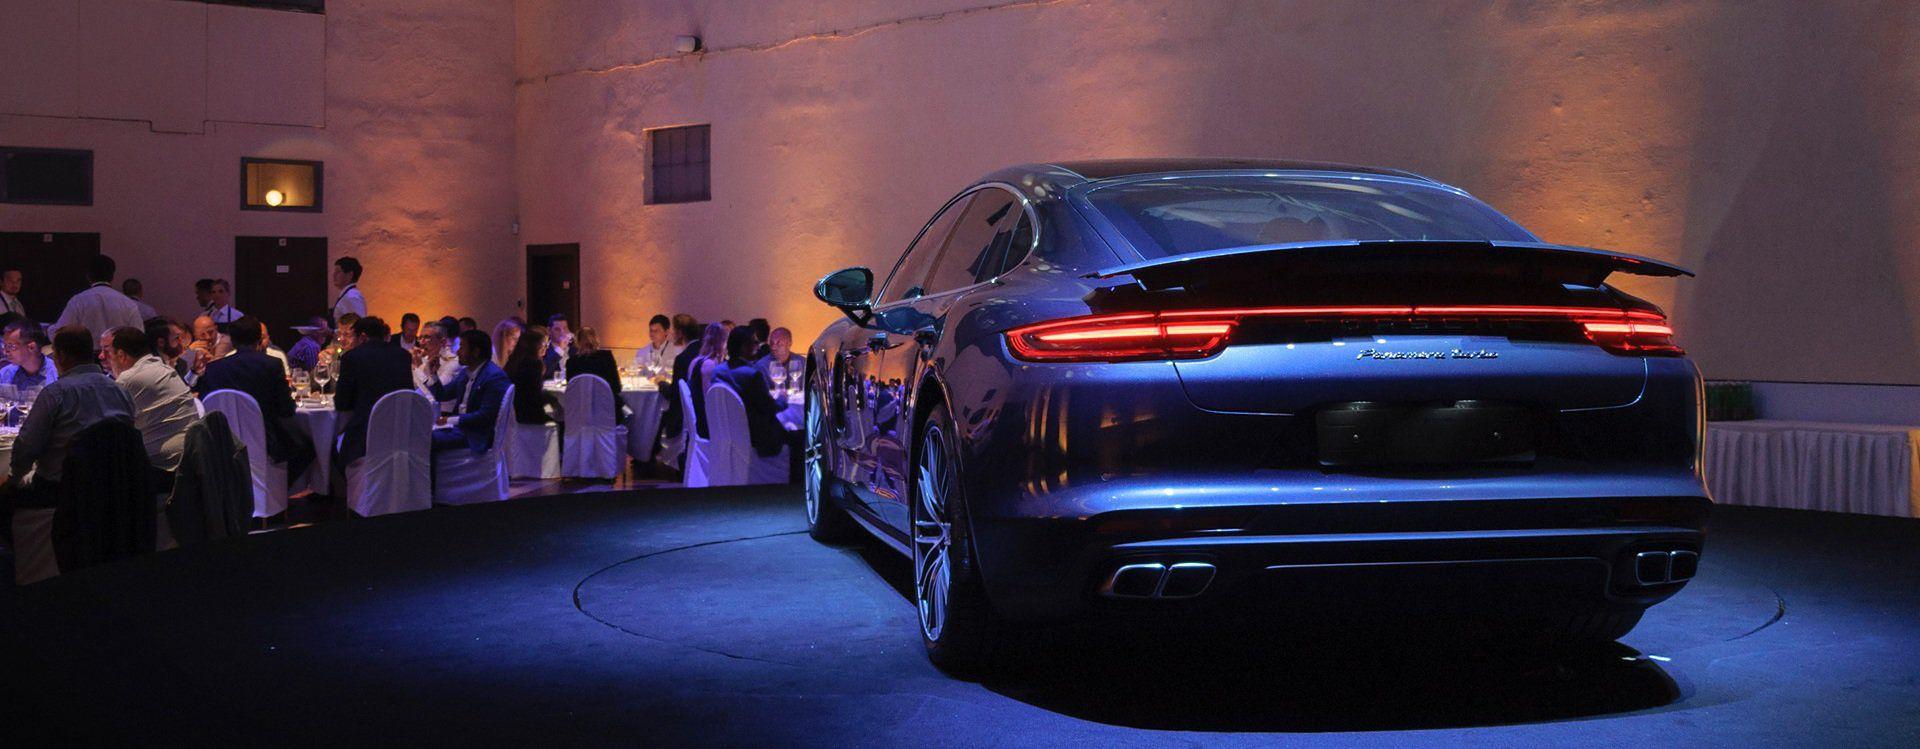 Nowe Porsche Panamera (2016)